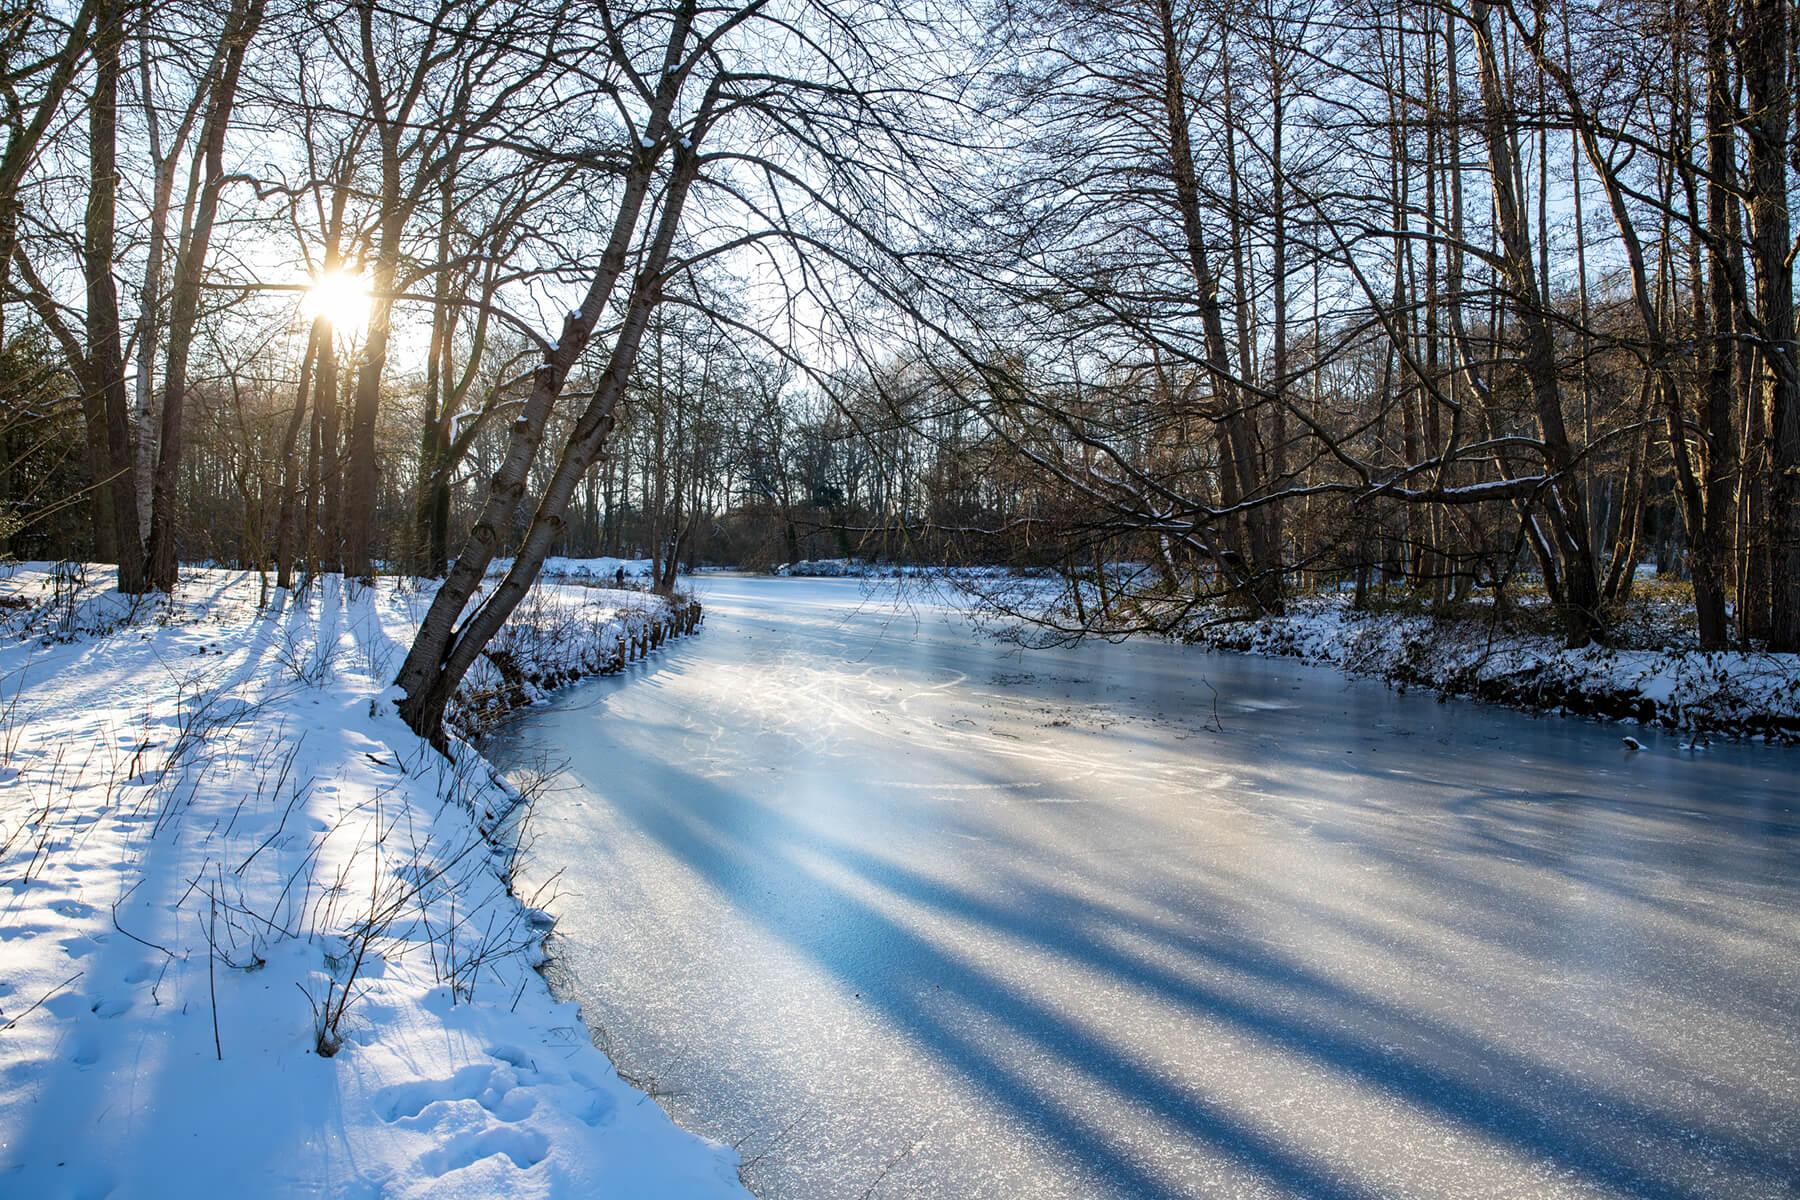 Walsen Ponds in Winter, Germany